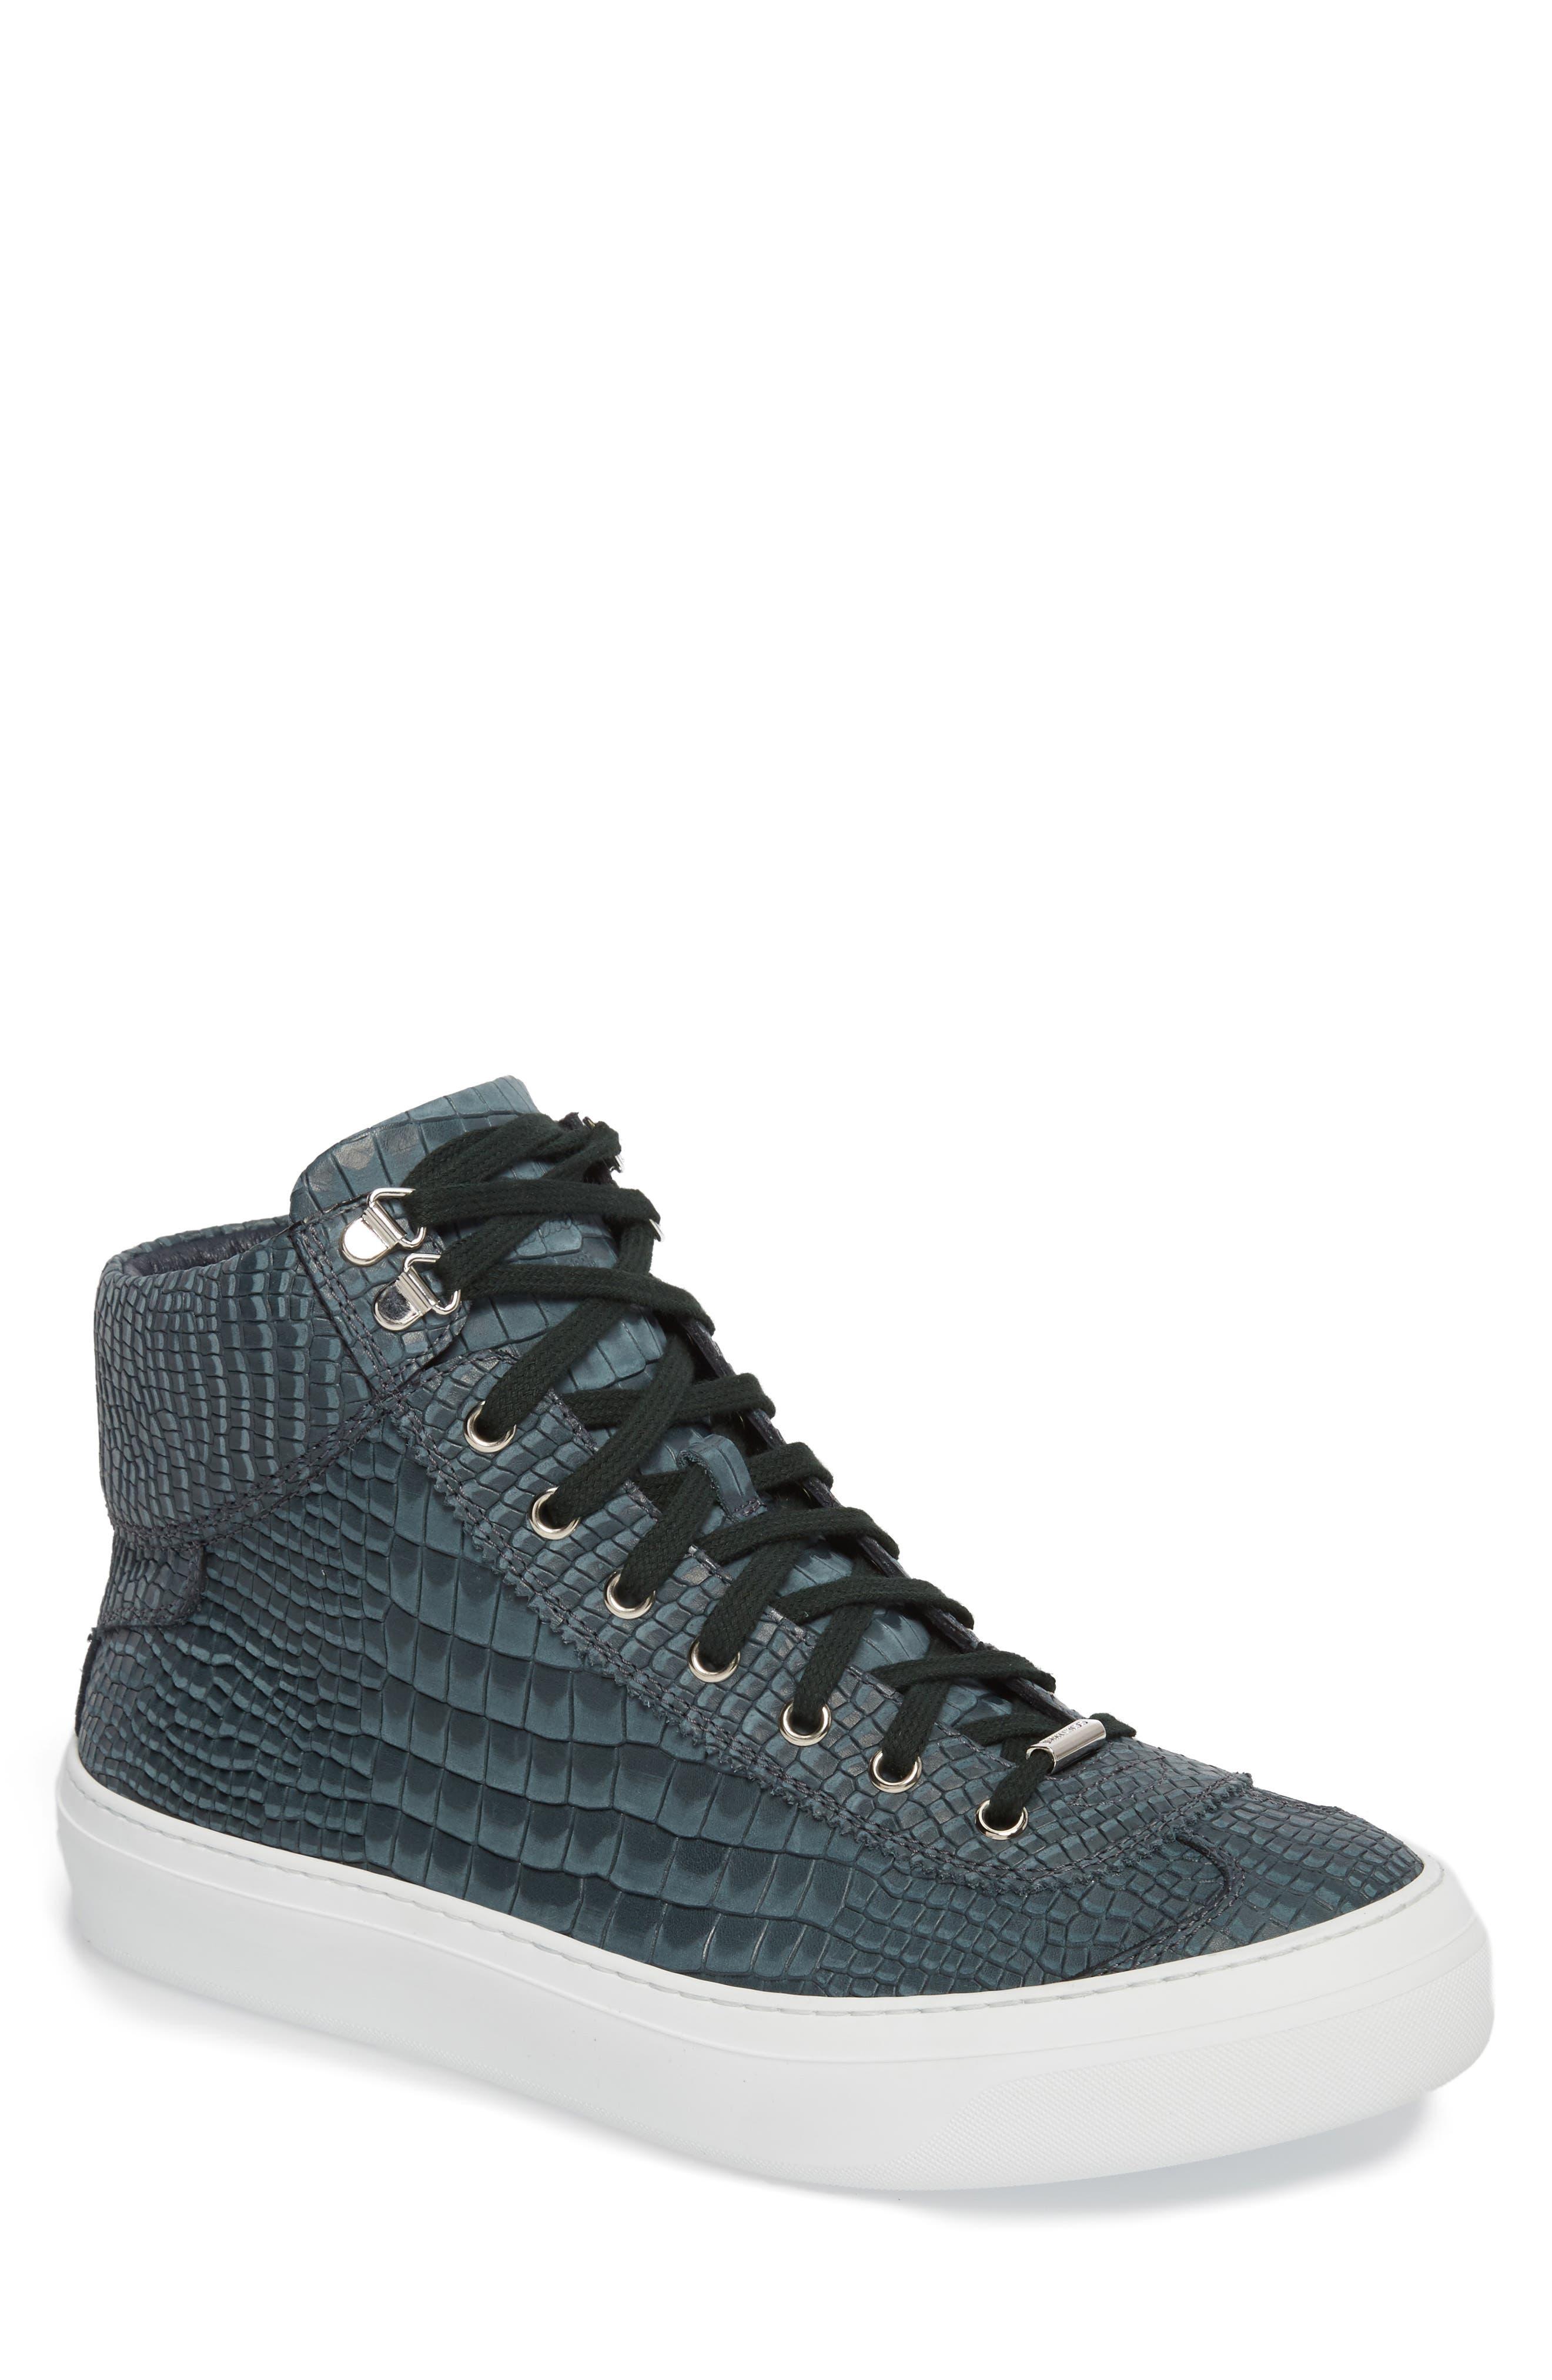 Argyle Sneaker,                             Main thumbnail 1, color,                             301